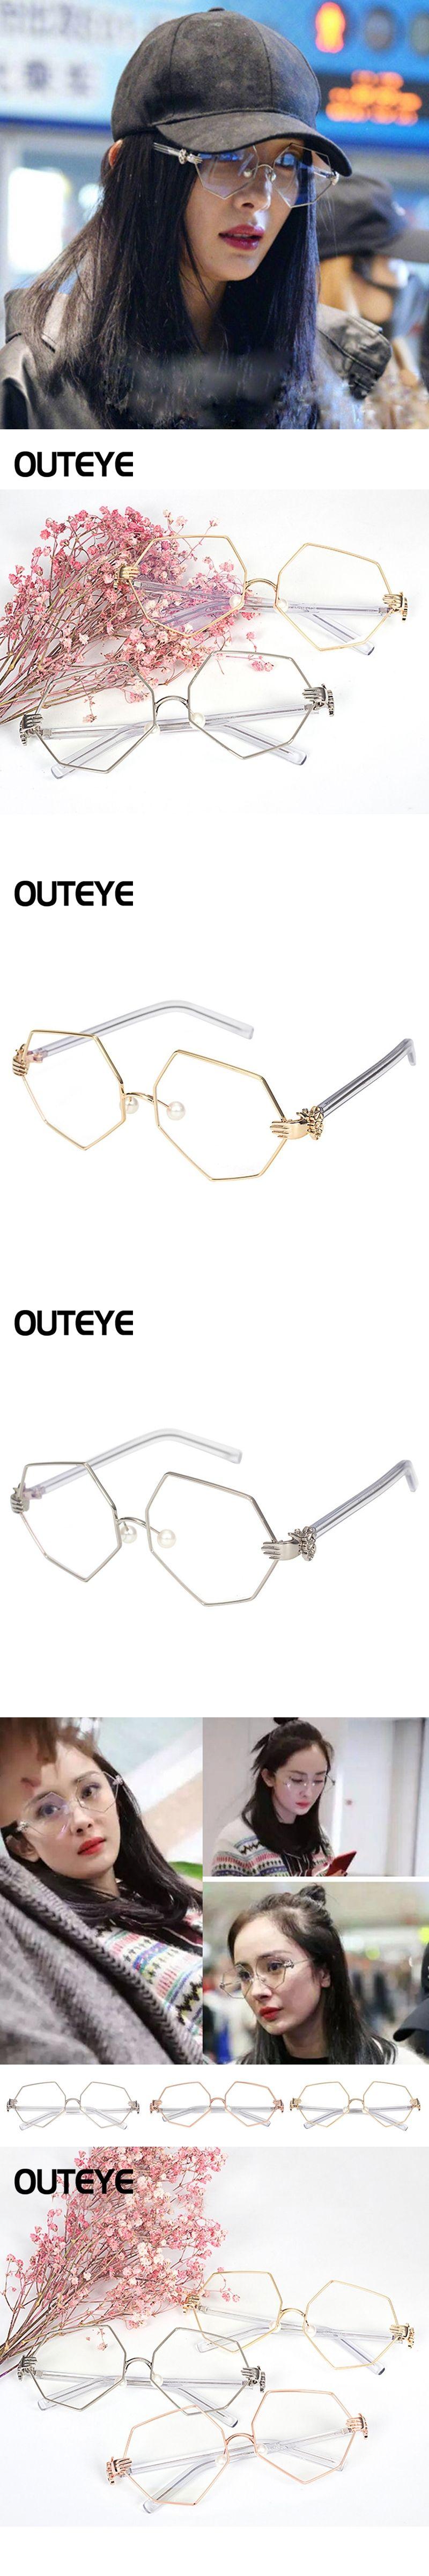 fd907f041ba OUTEYE Vintage Hexagon Square Women Eye Glasses frames Plain Mirror Clear  Lens Harajuku big Metal frame